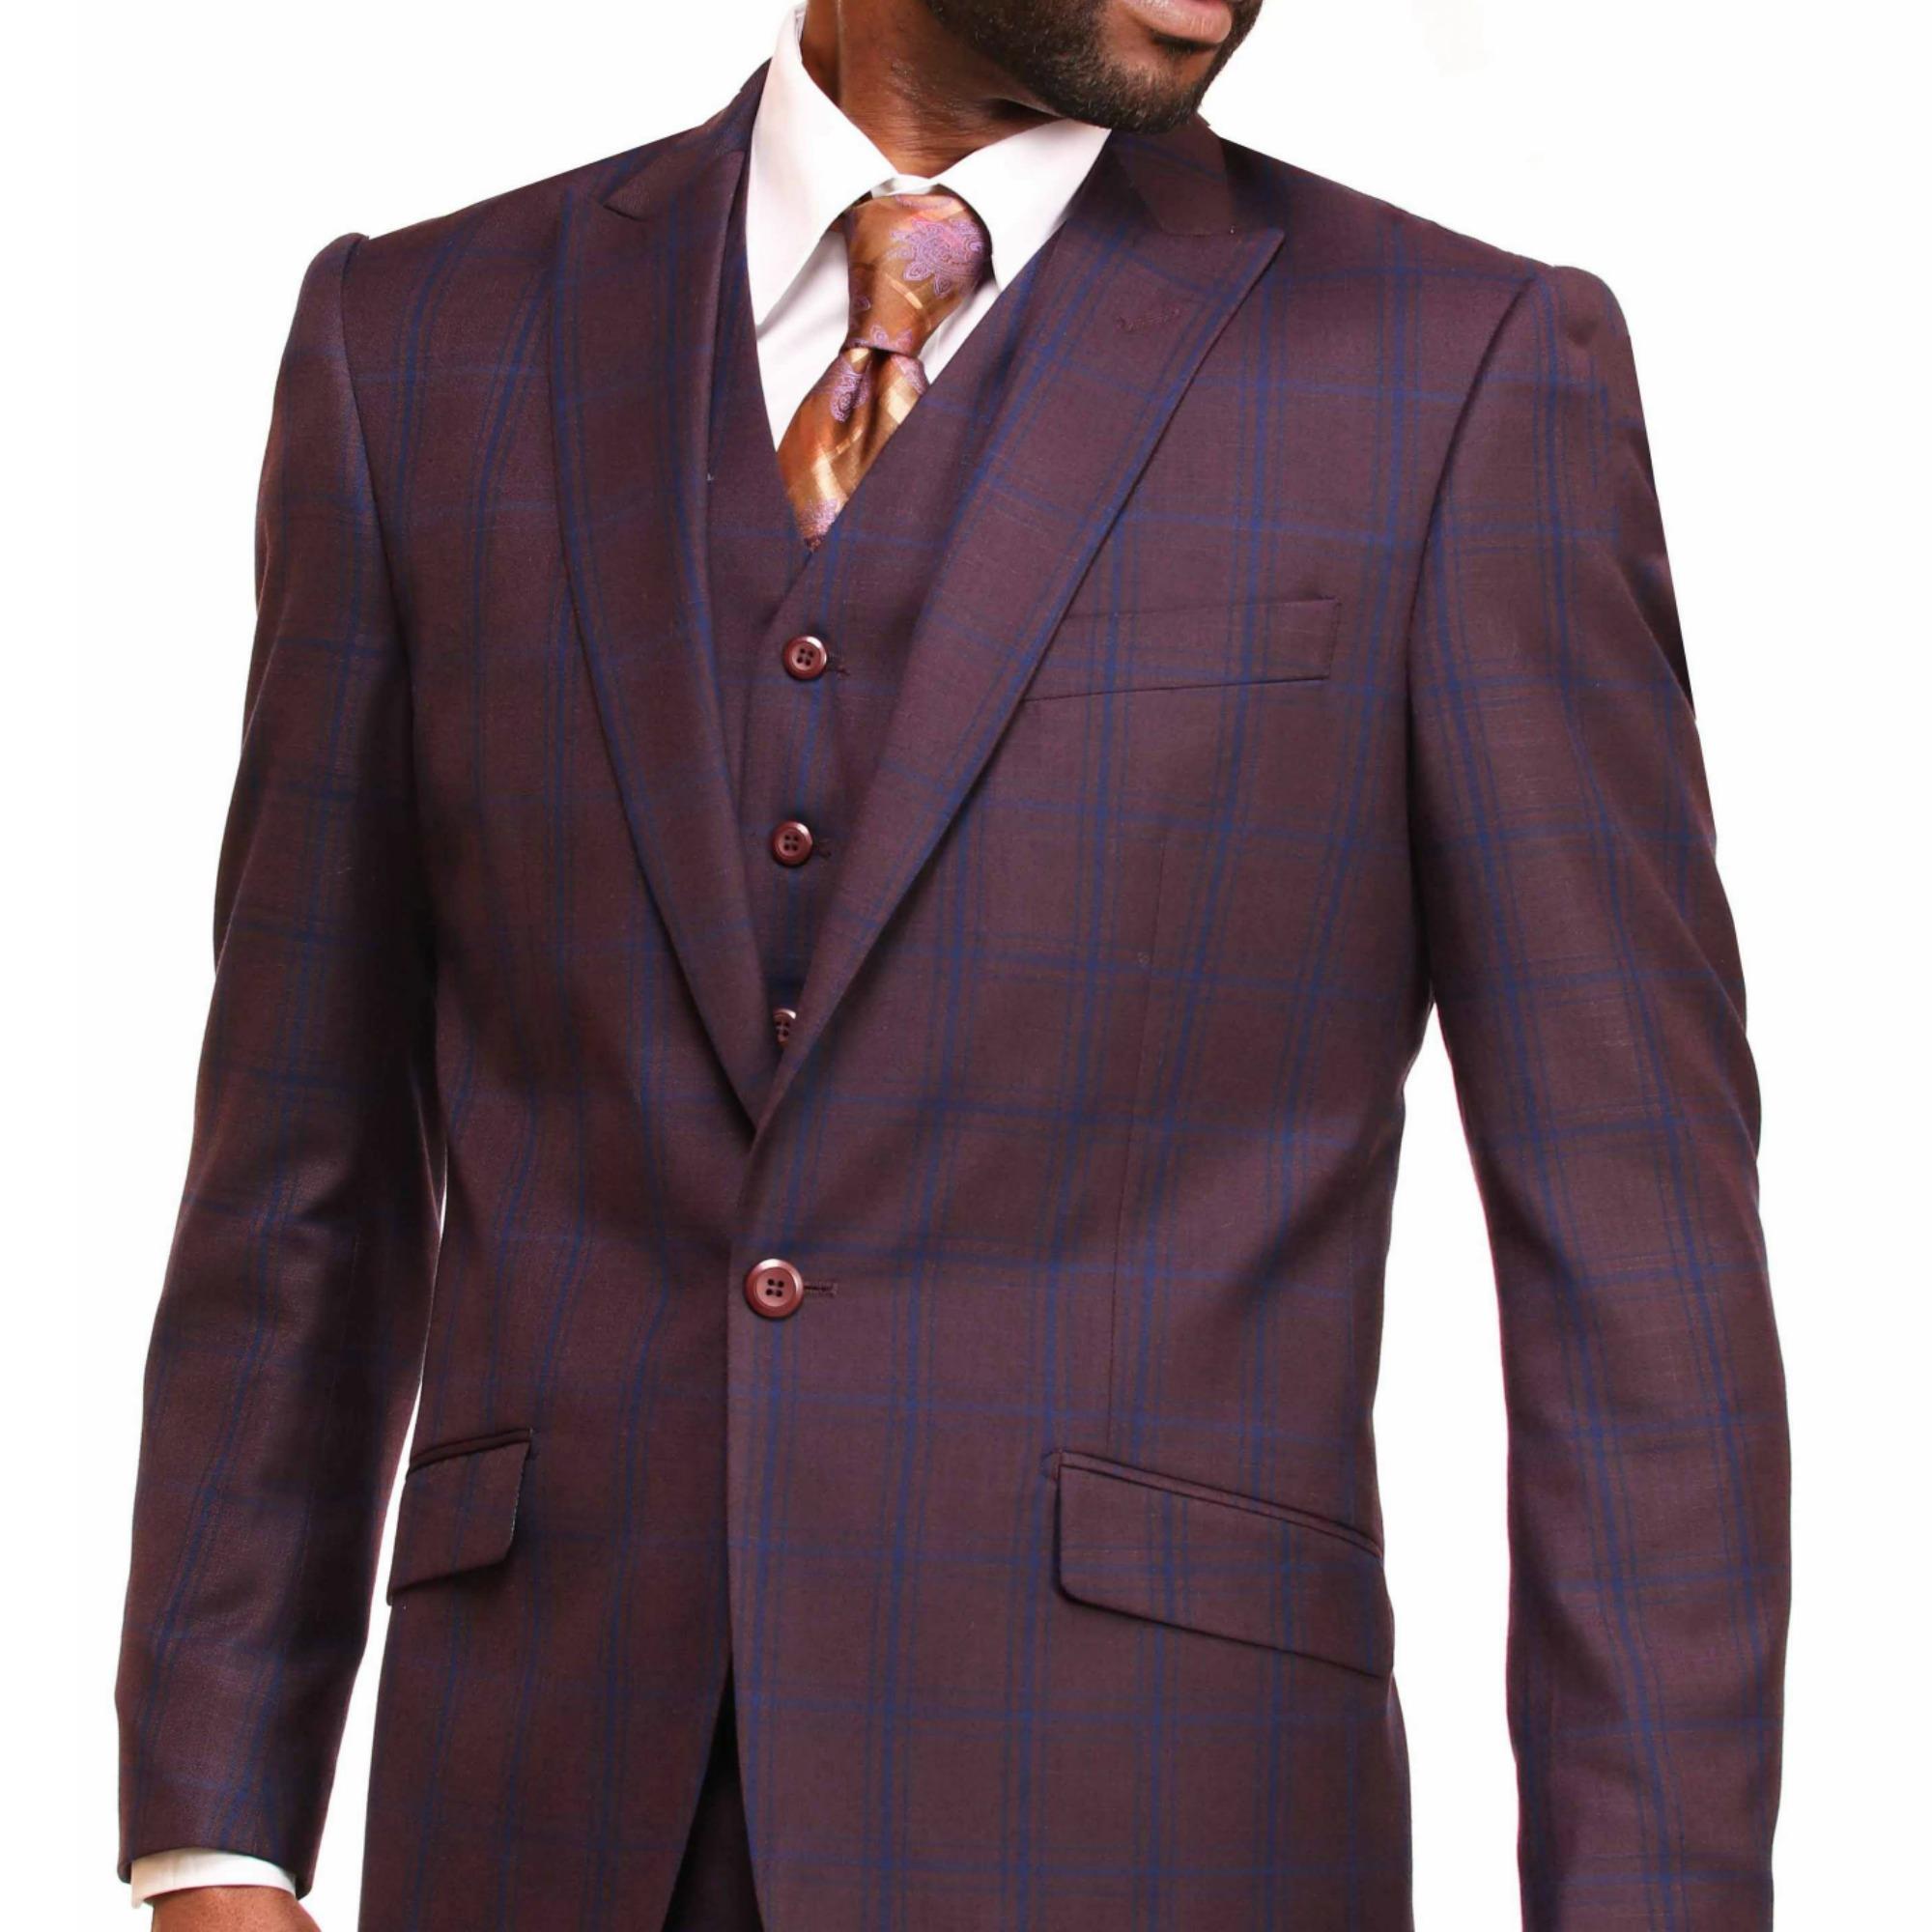 Burgundy Vested Suit